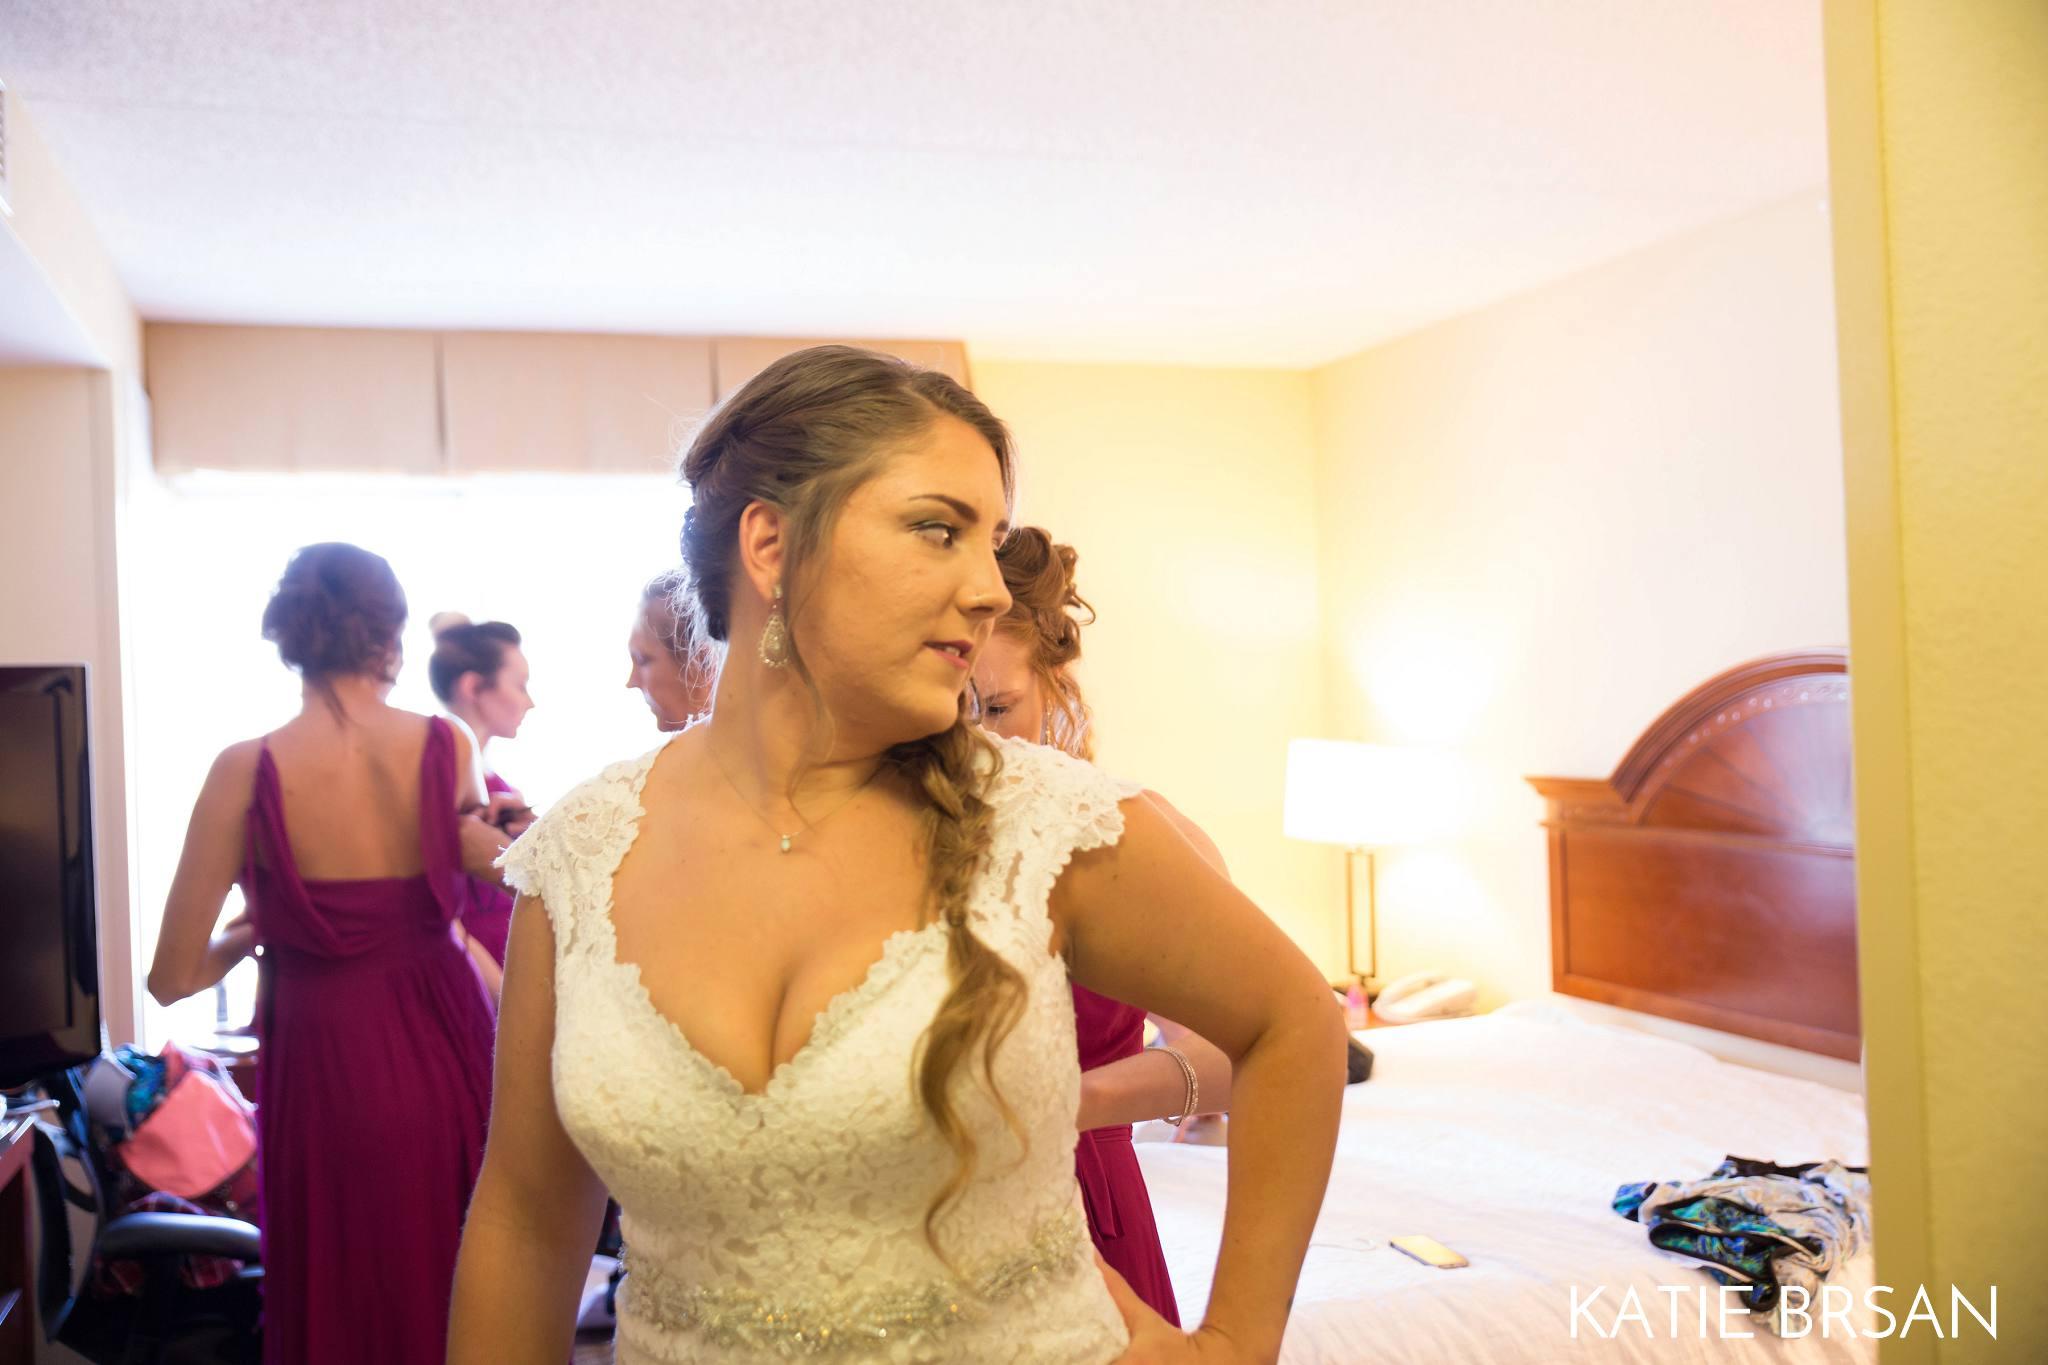 KatieBrsan-Bonfield-Backyard-Wedding_0391.jpg